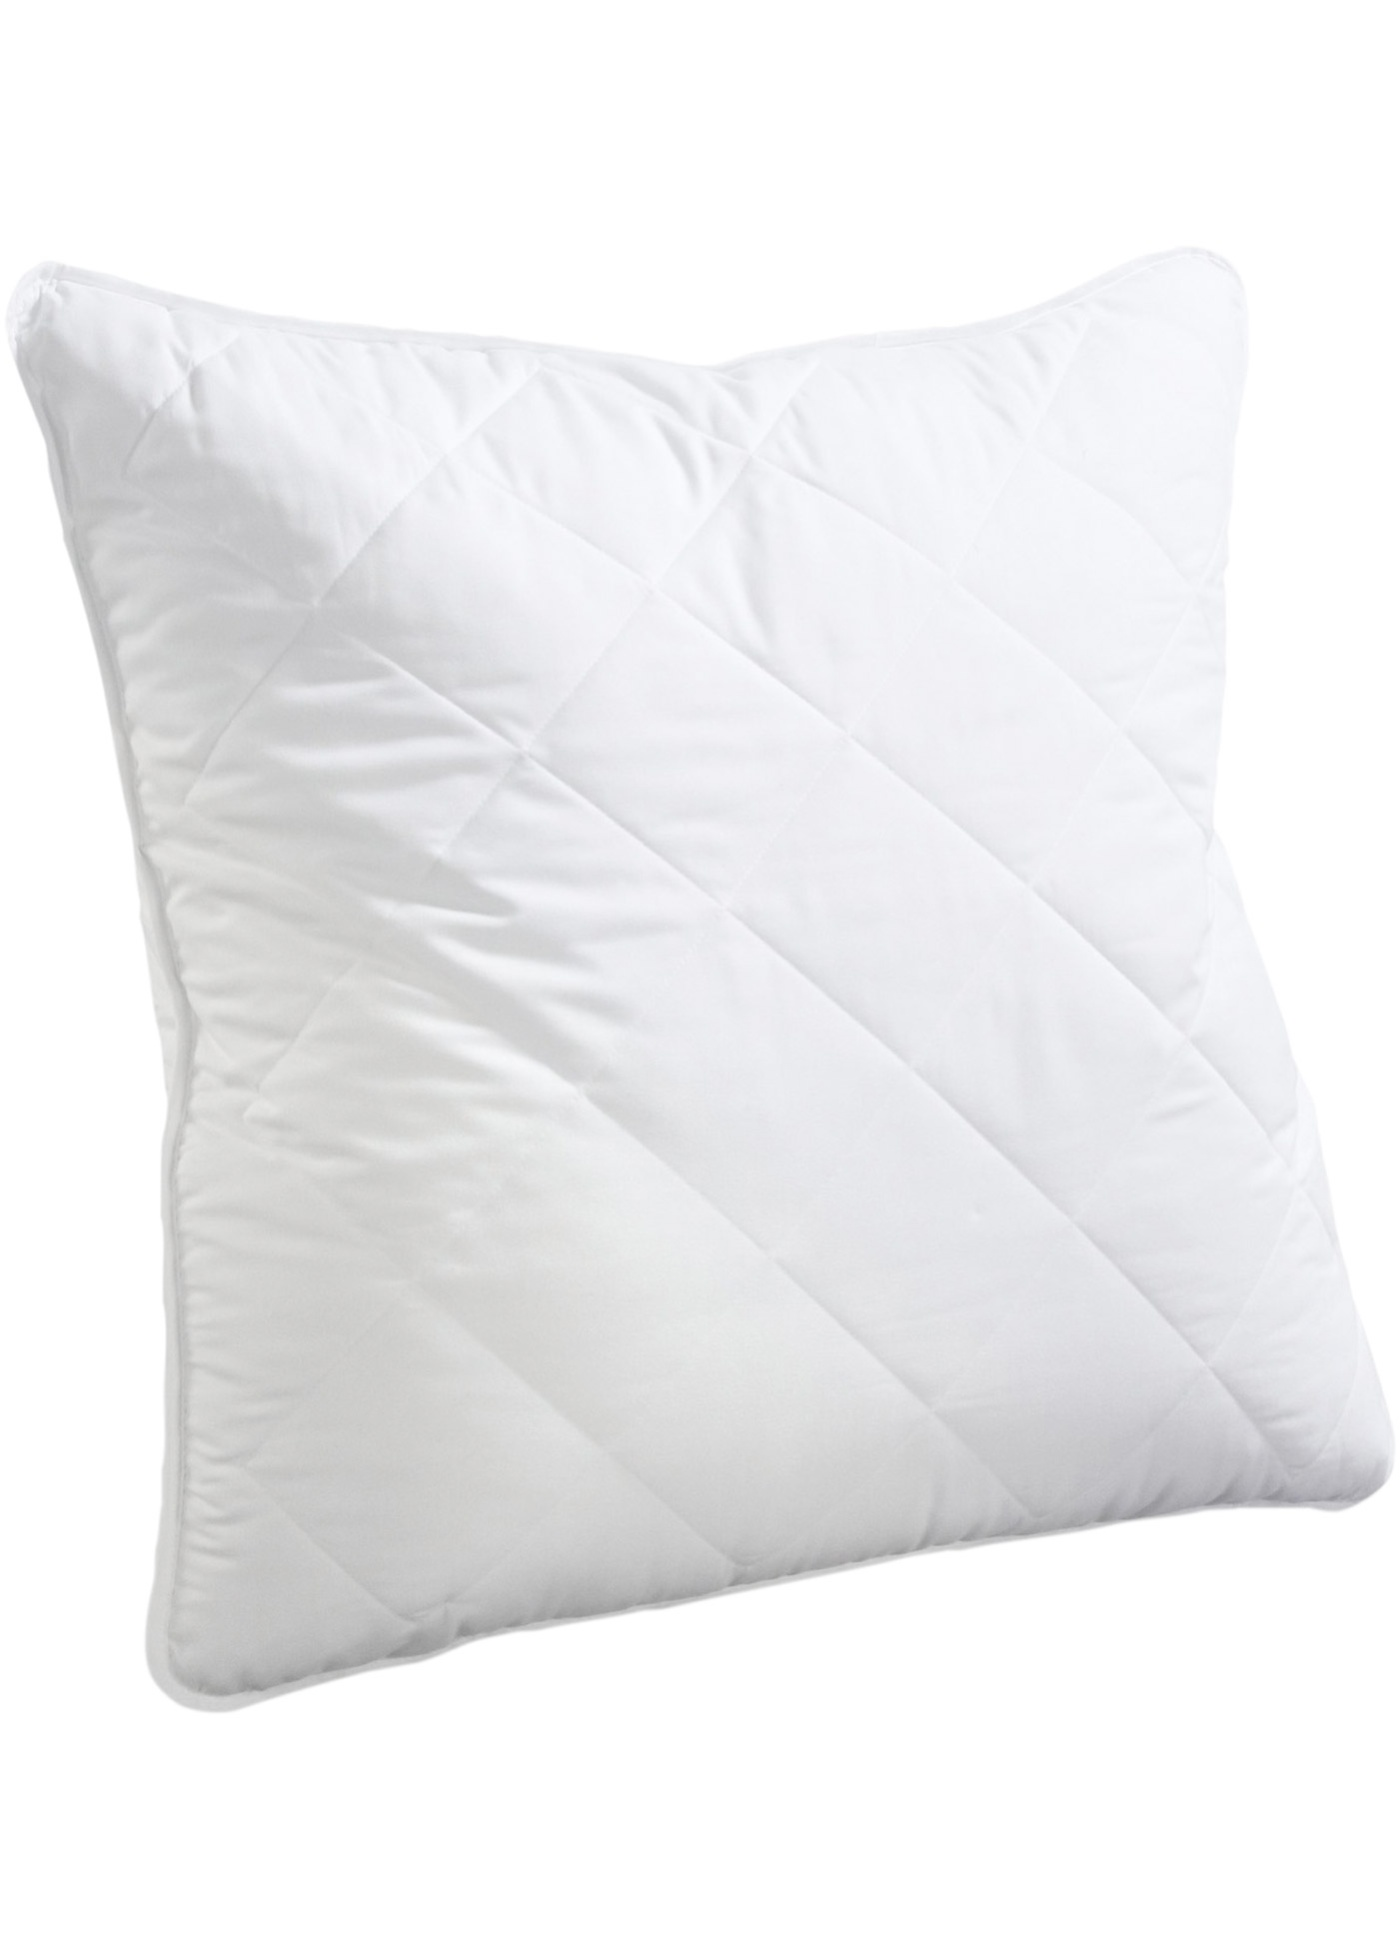 Cuscino in poliestere (Bianco) - bpc living bonprix collection